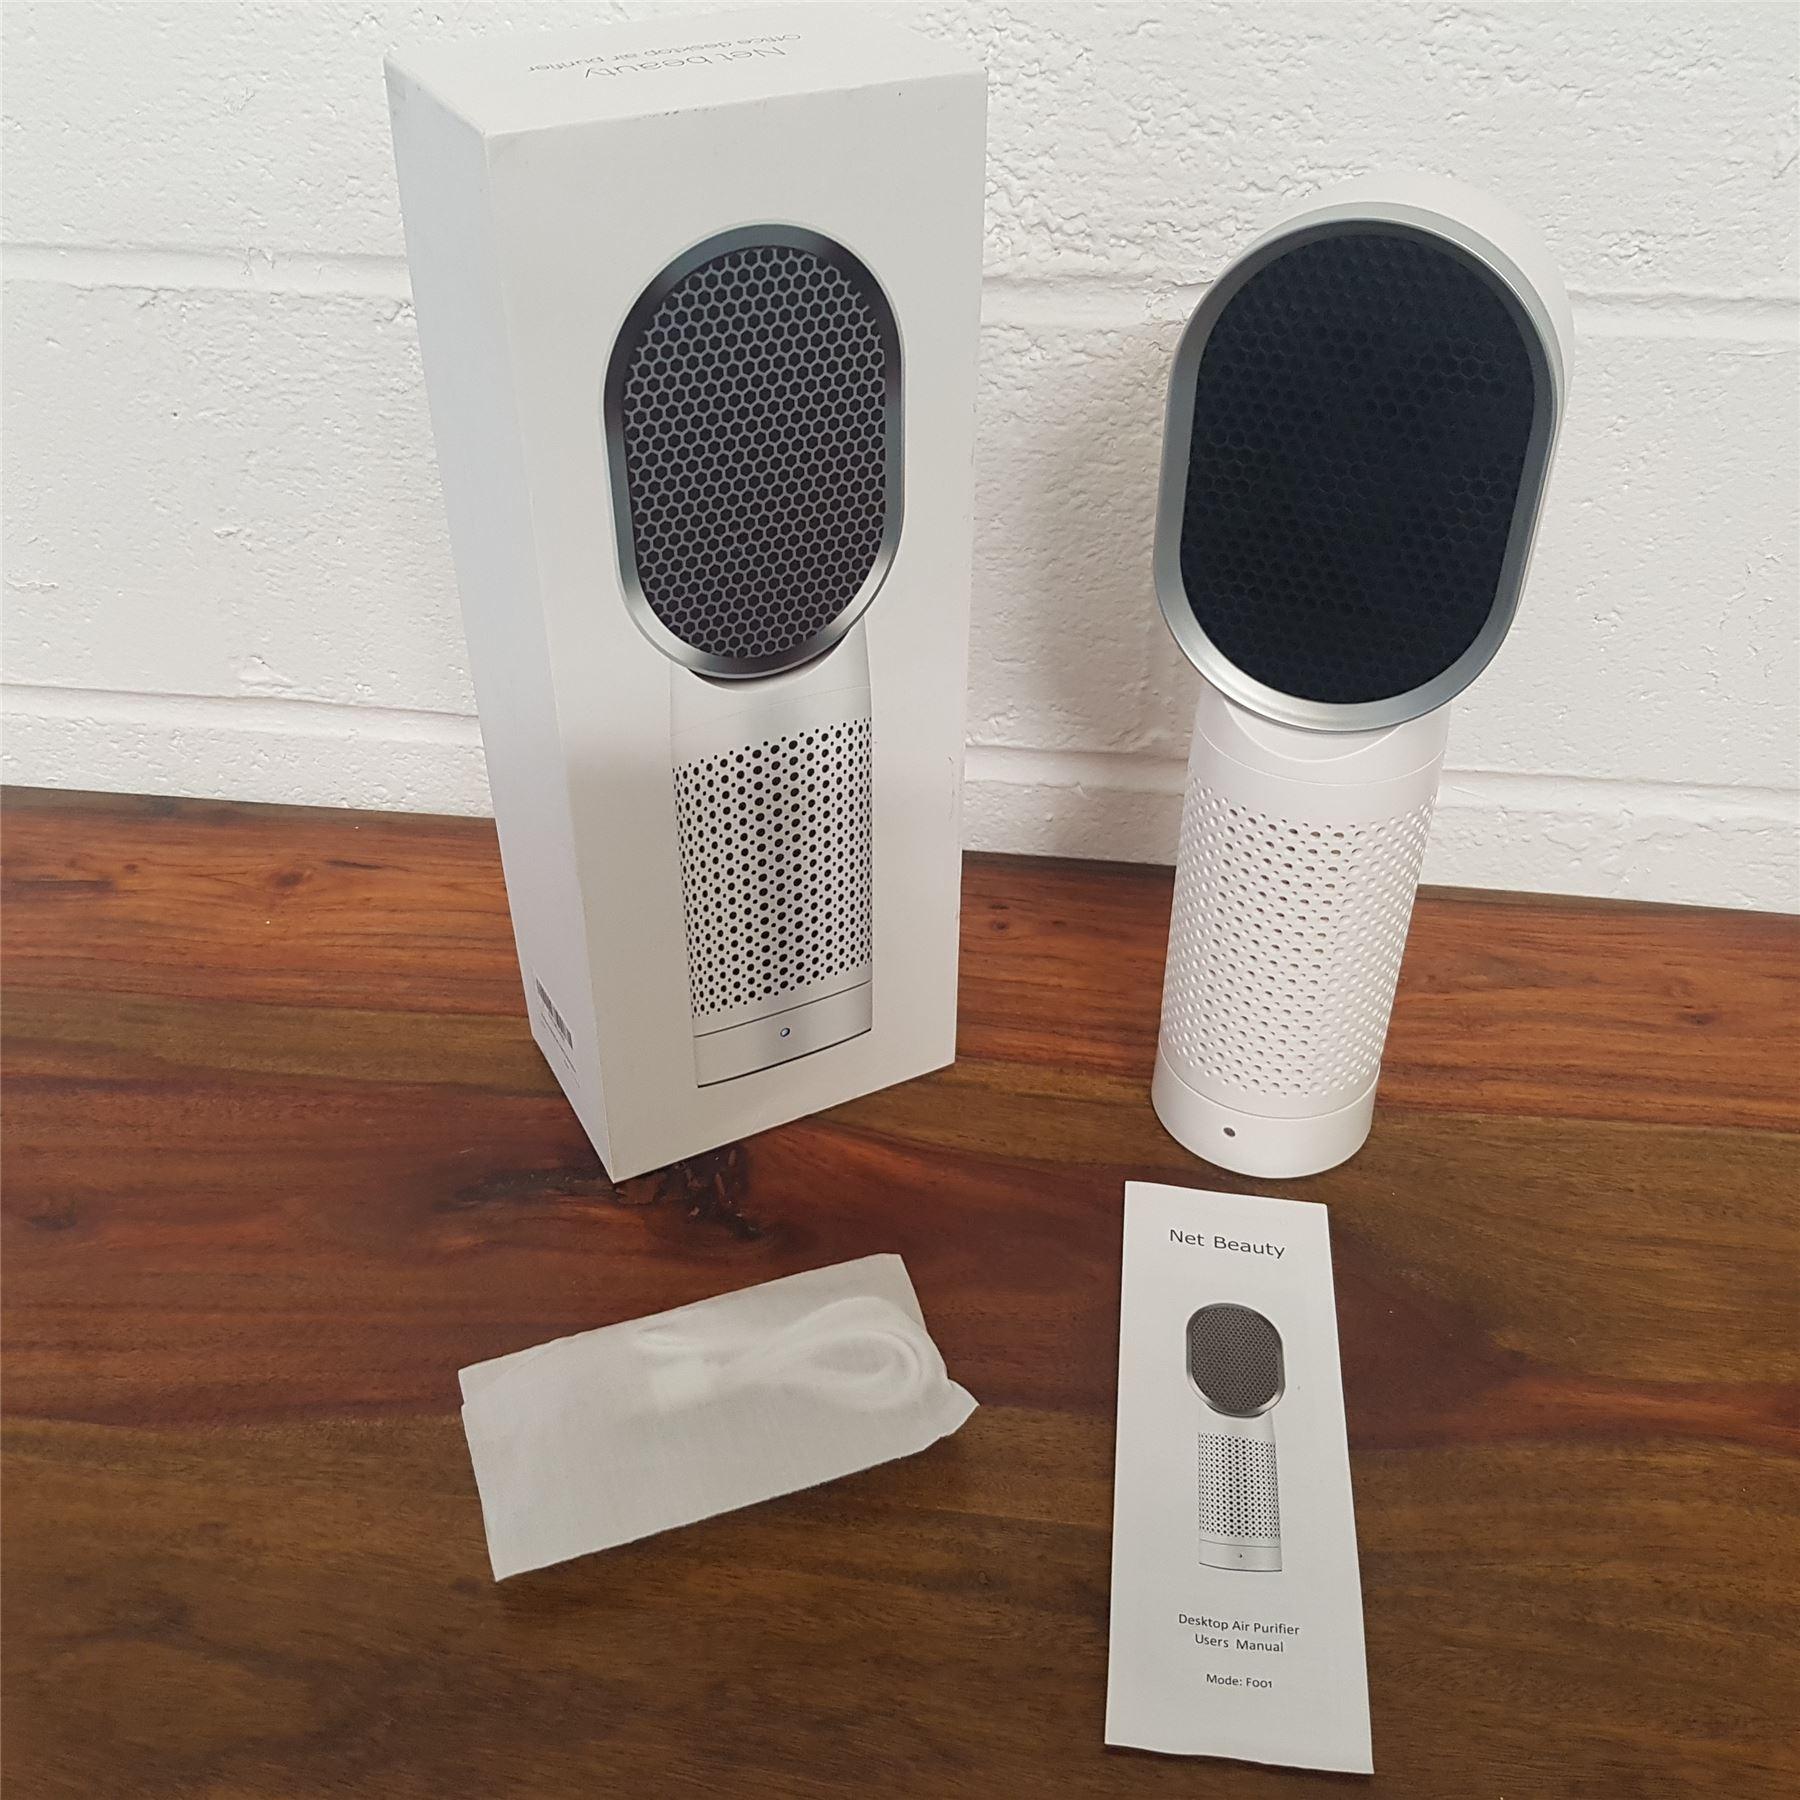 Net beauty office desktop air purifier cleaner f001 for Office air purifier amazon